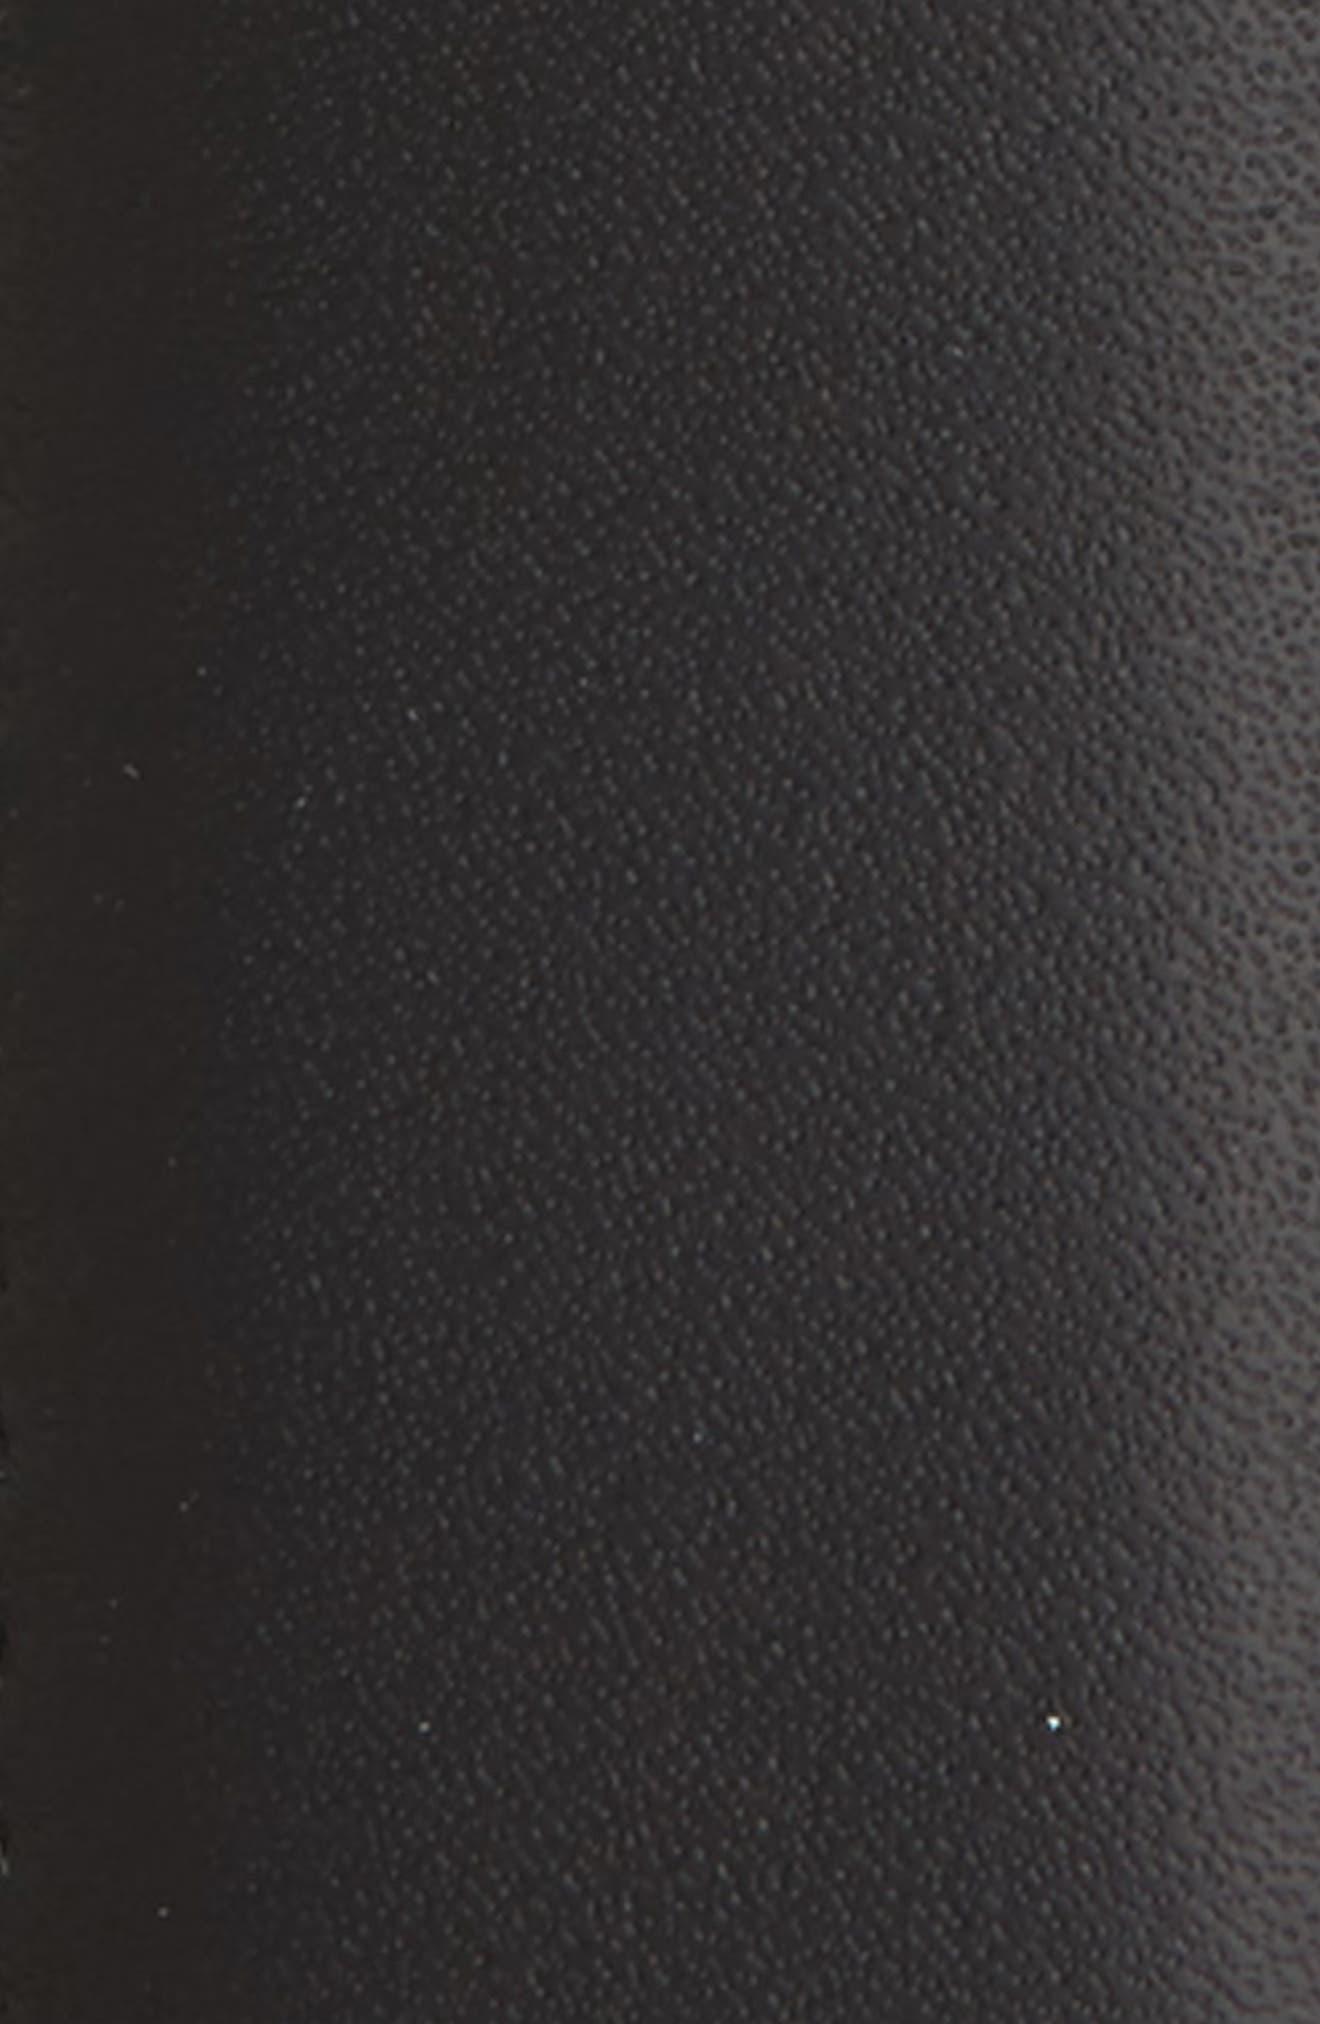 MONTBLANC, Square Buckle Reversible Leather Belt, Alternate thumbnail 3, color, BLACK/ BROWN